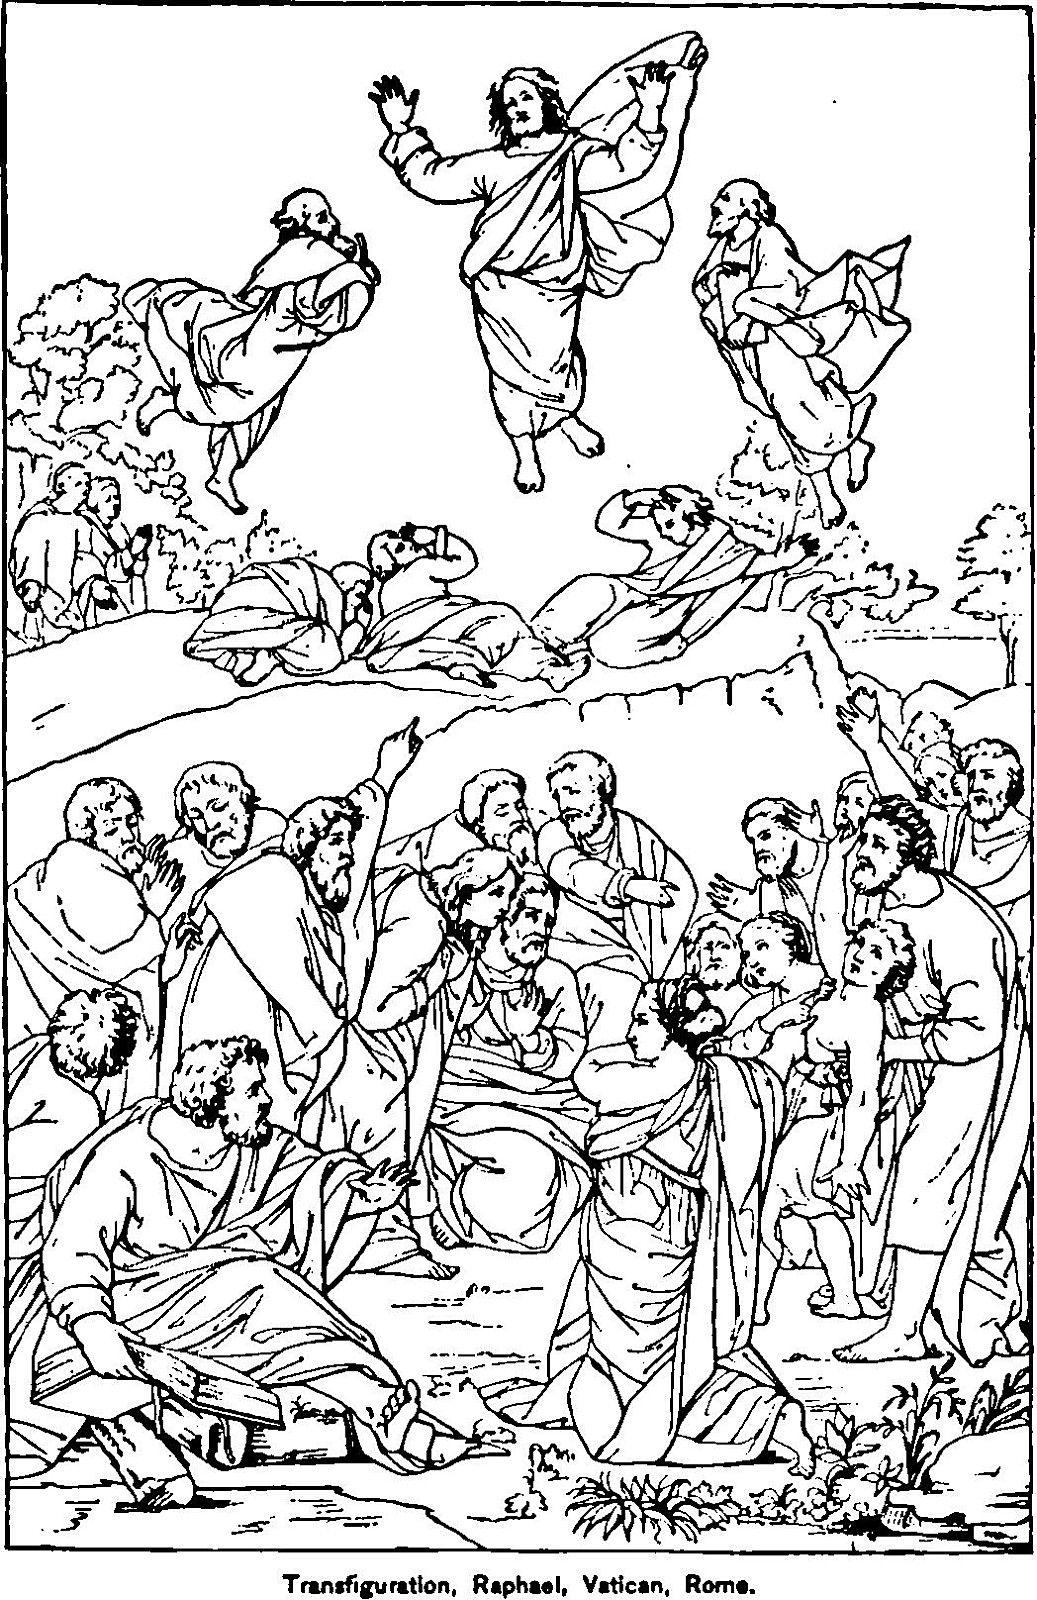 The Transfiguration Catholic Coloring Page Transfiguration Raphael Vatican Rome Jesus Coloring Pages Catholic Coloring Coloring Pages